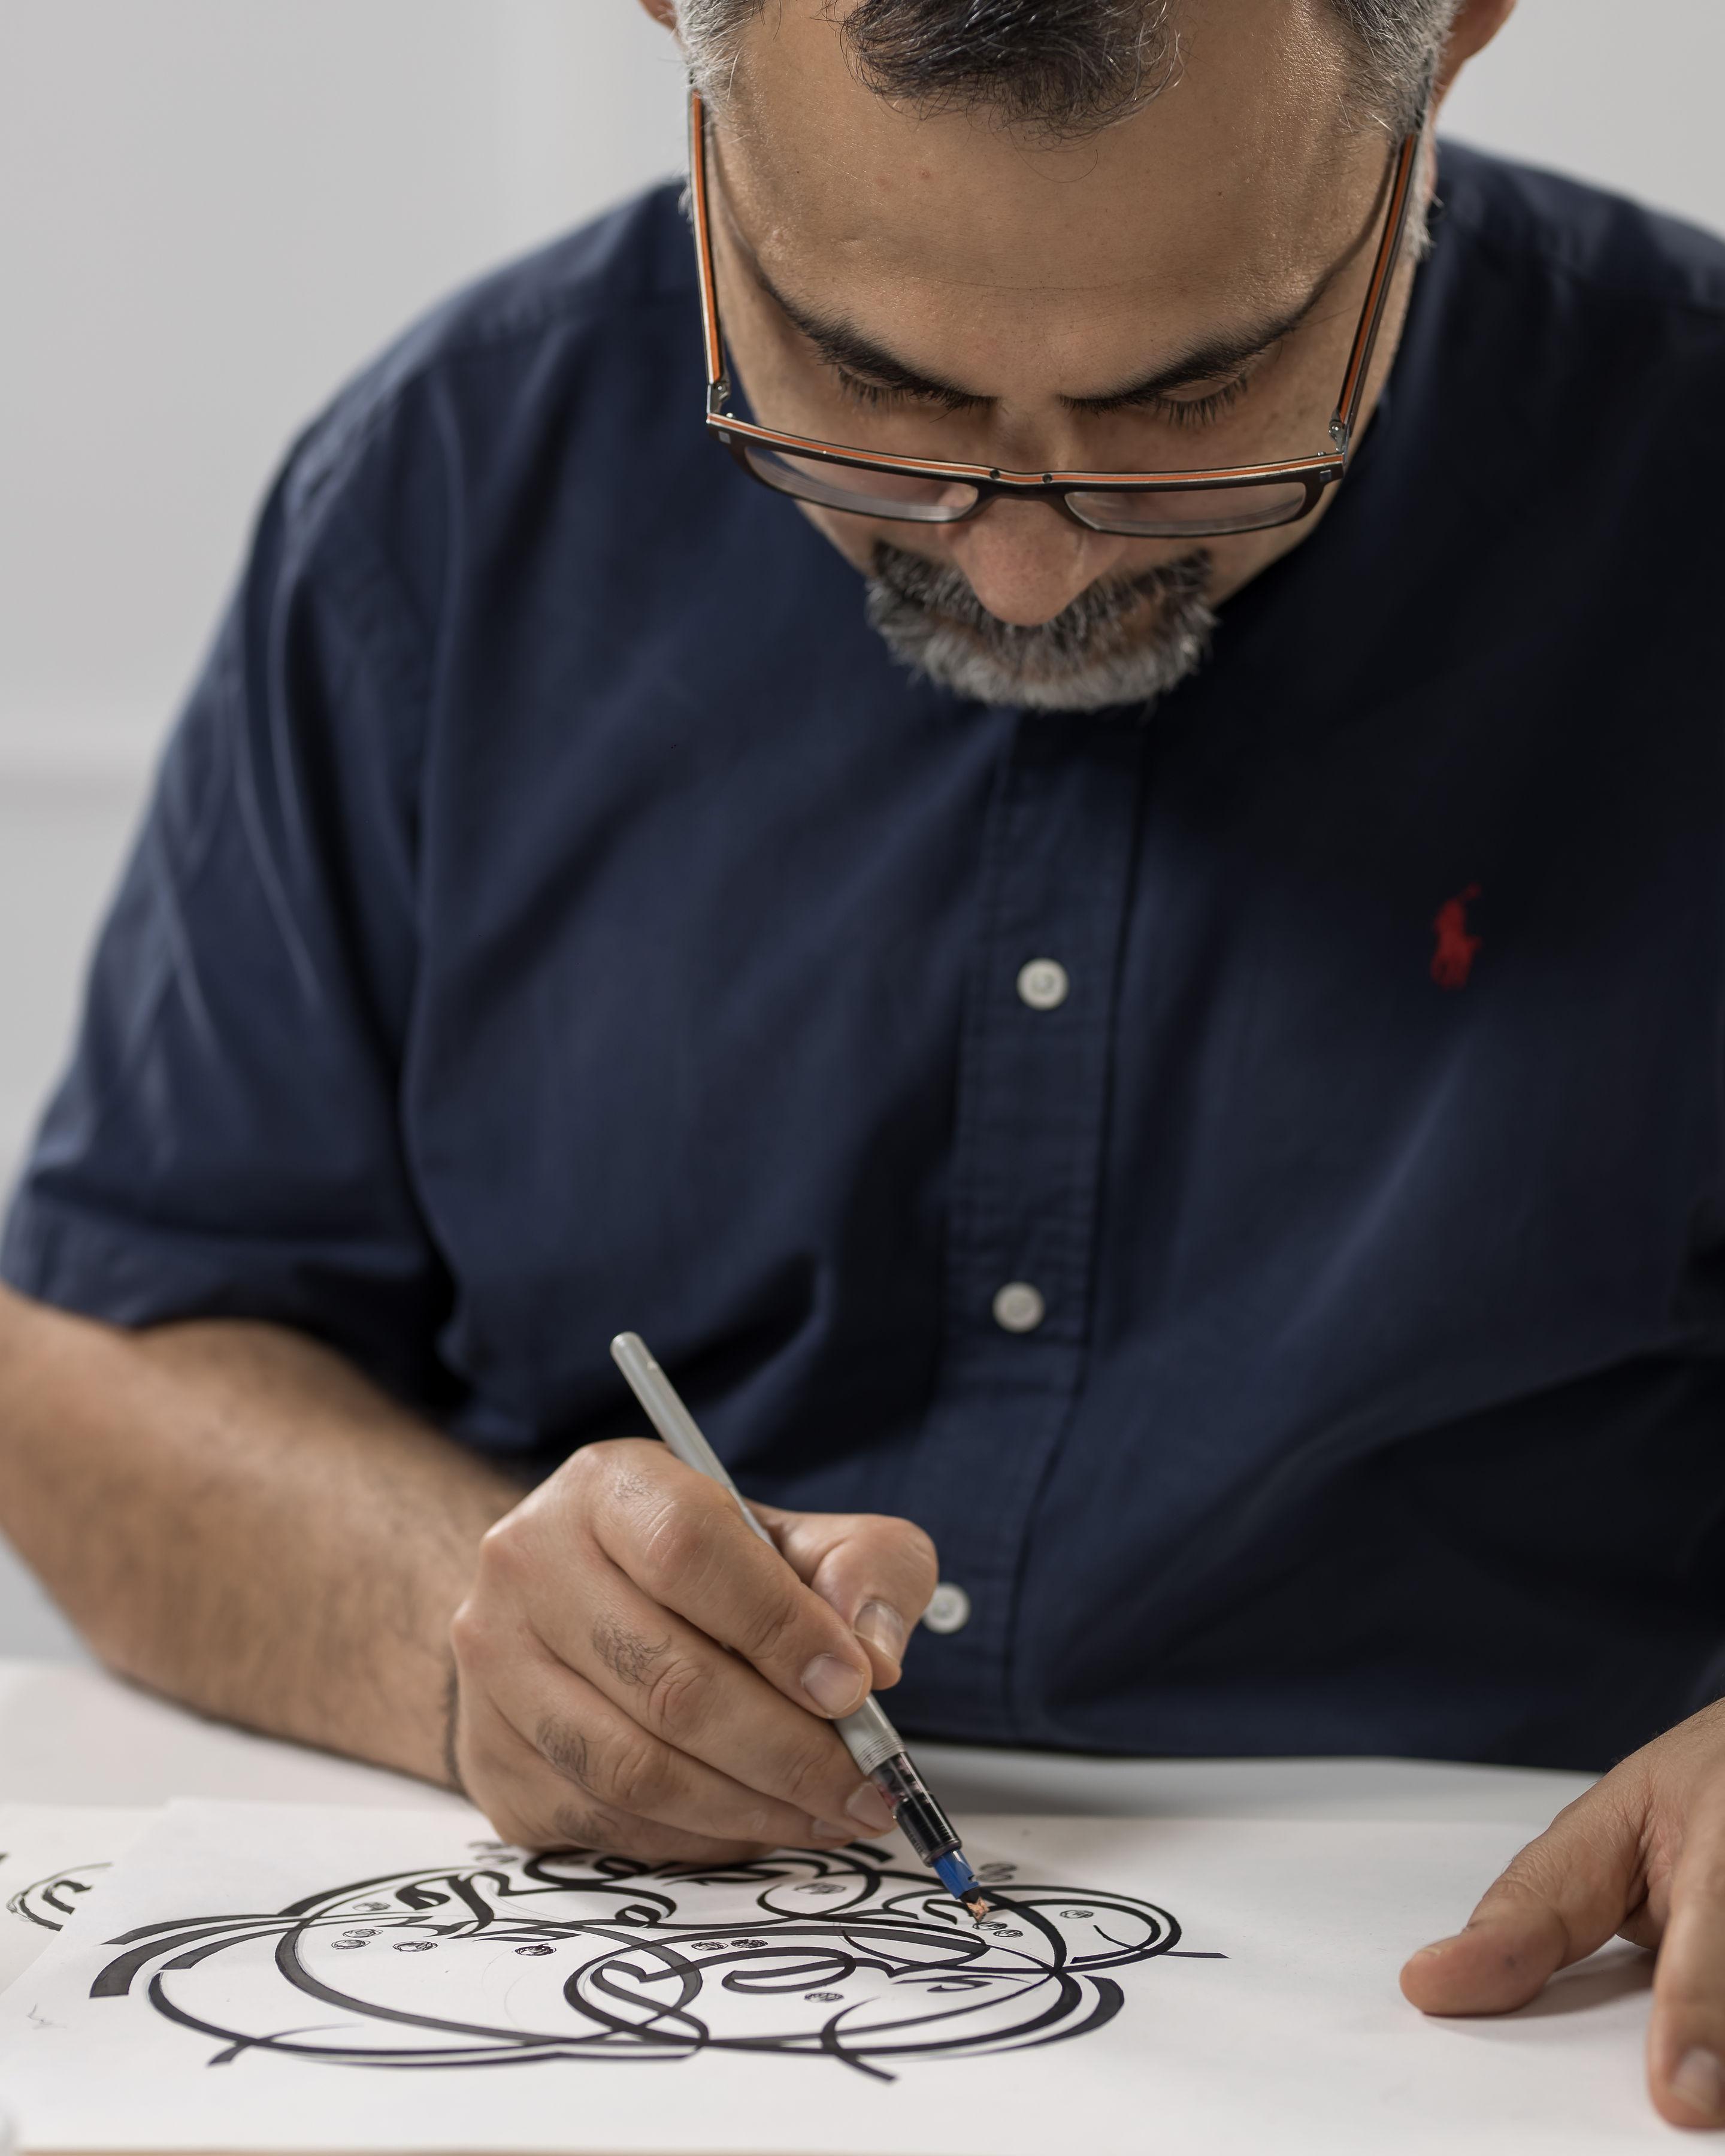 الفنان وسام شوكت